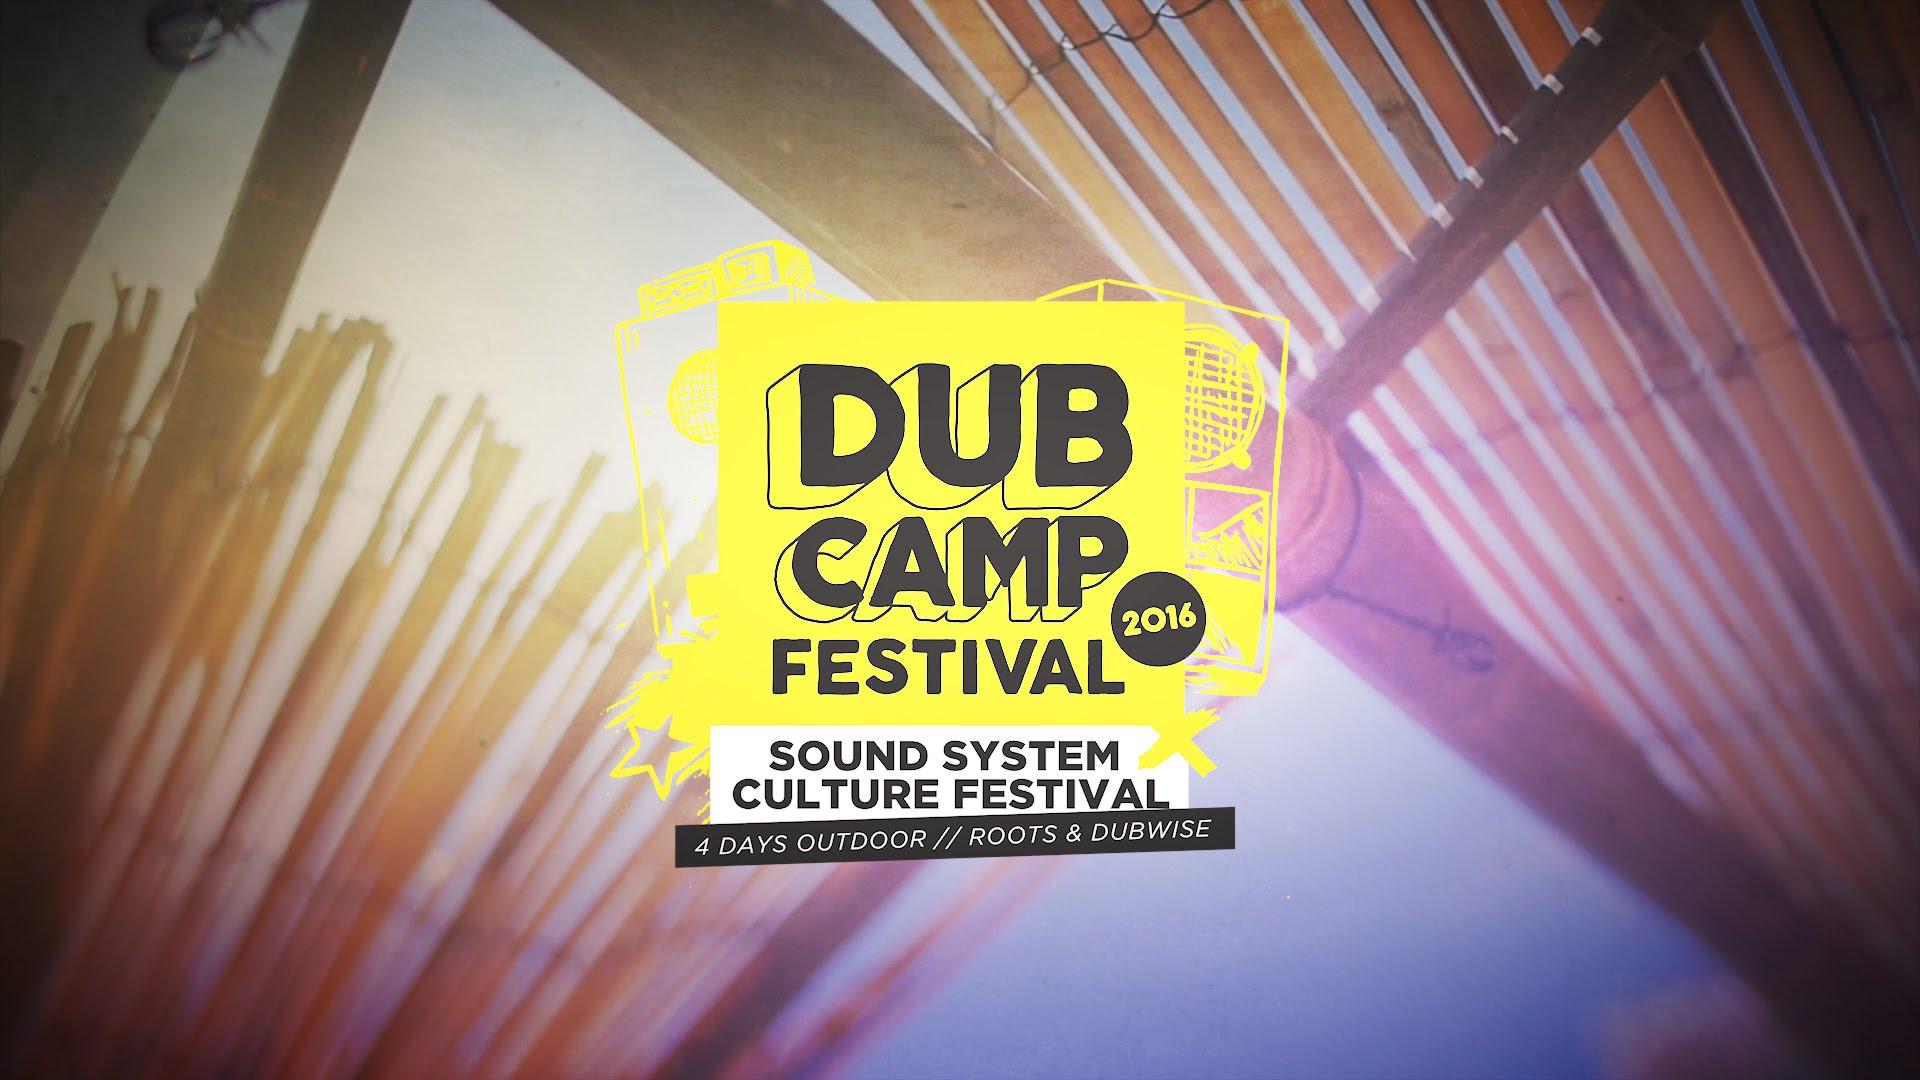 Dub Camp Festival 2016 - Aftermovie [7/10/2016]